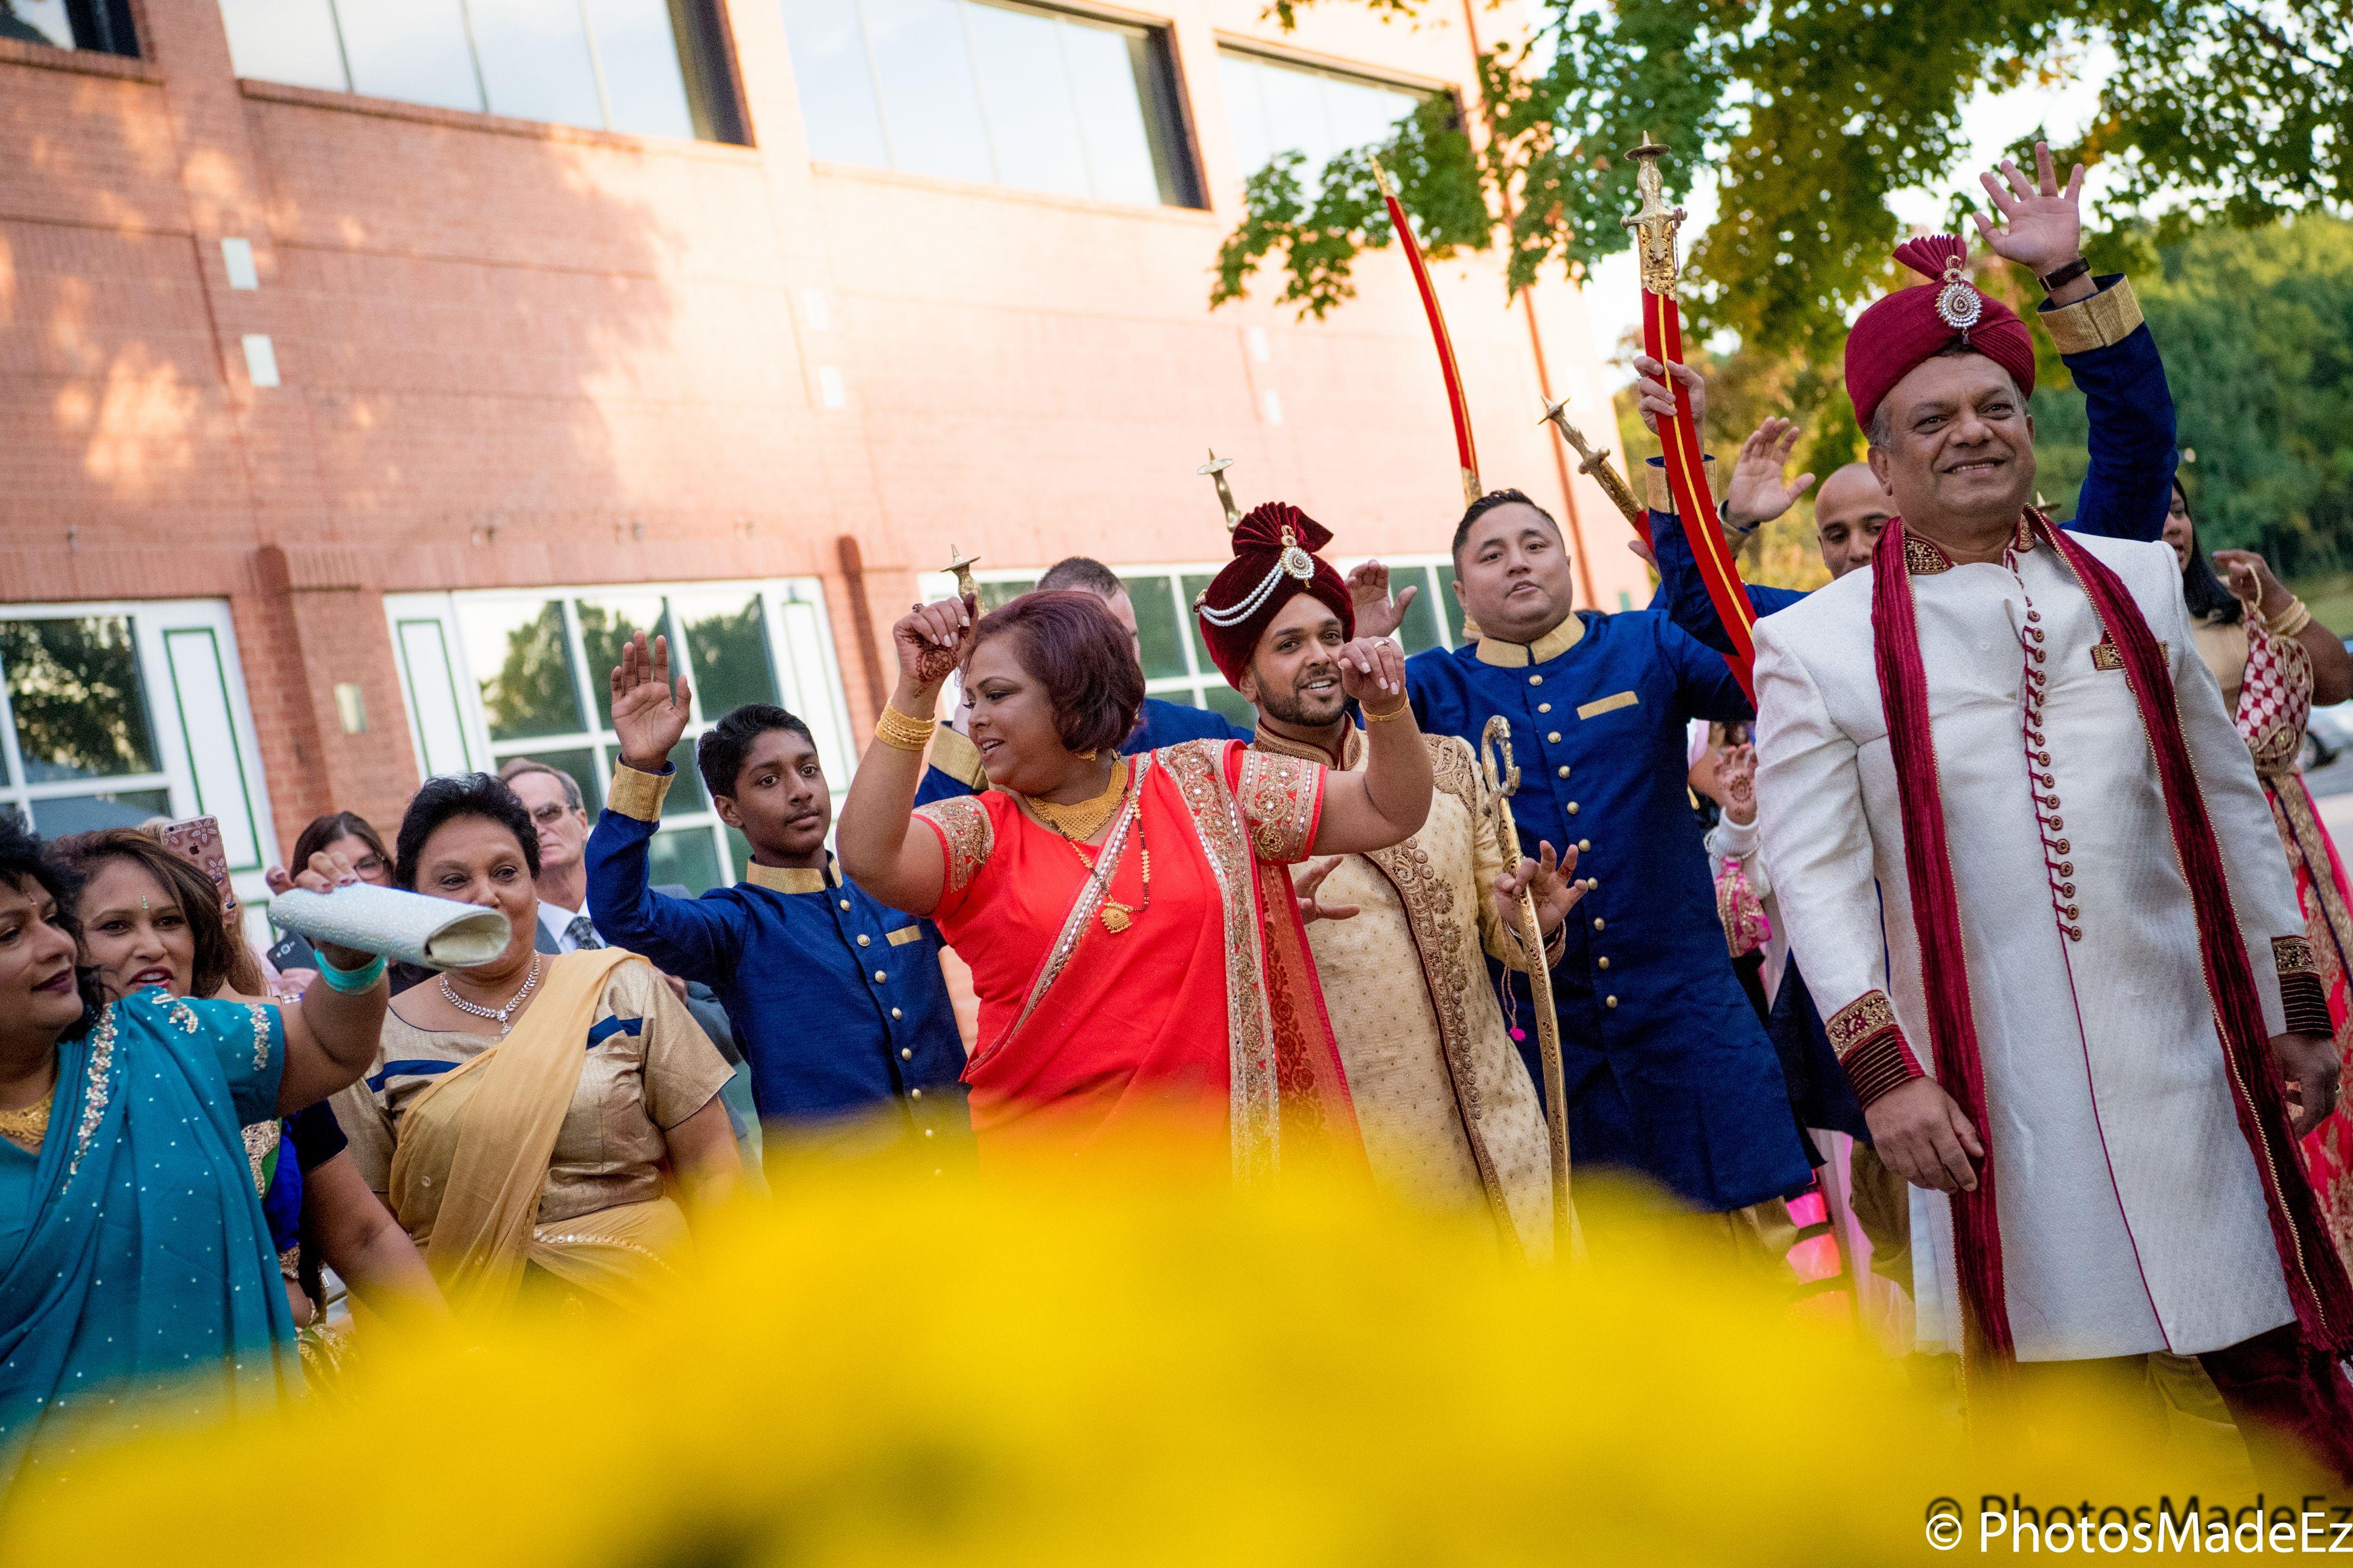 Baraat For Hindu Wedding At The Mansion In Voorhees New Jersey Conducted By Dj Raj Entertai Best Wedding Photographers Hindu Wedding Award Winning Photographer